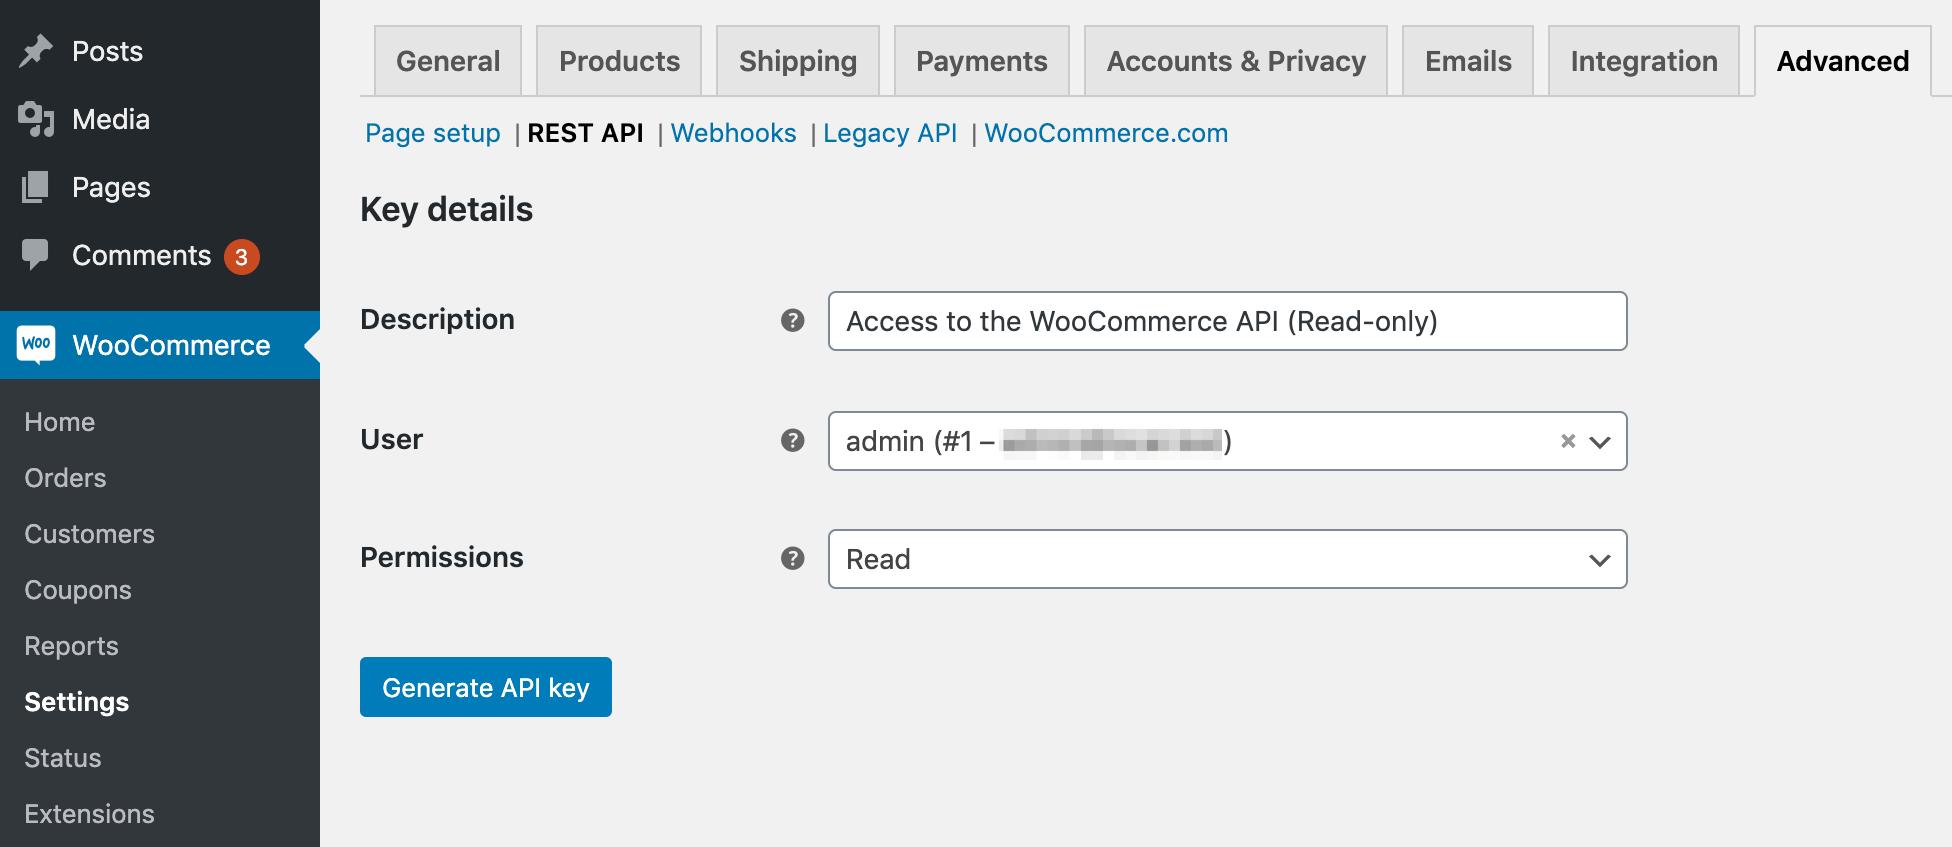 a-simple-guide-to-the-woocommerce-api-1 WooCommerce API的简单指南